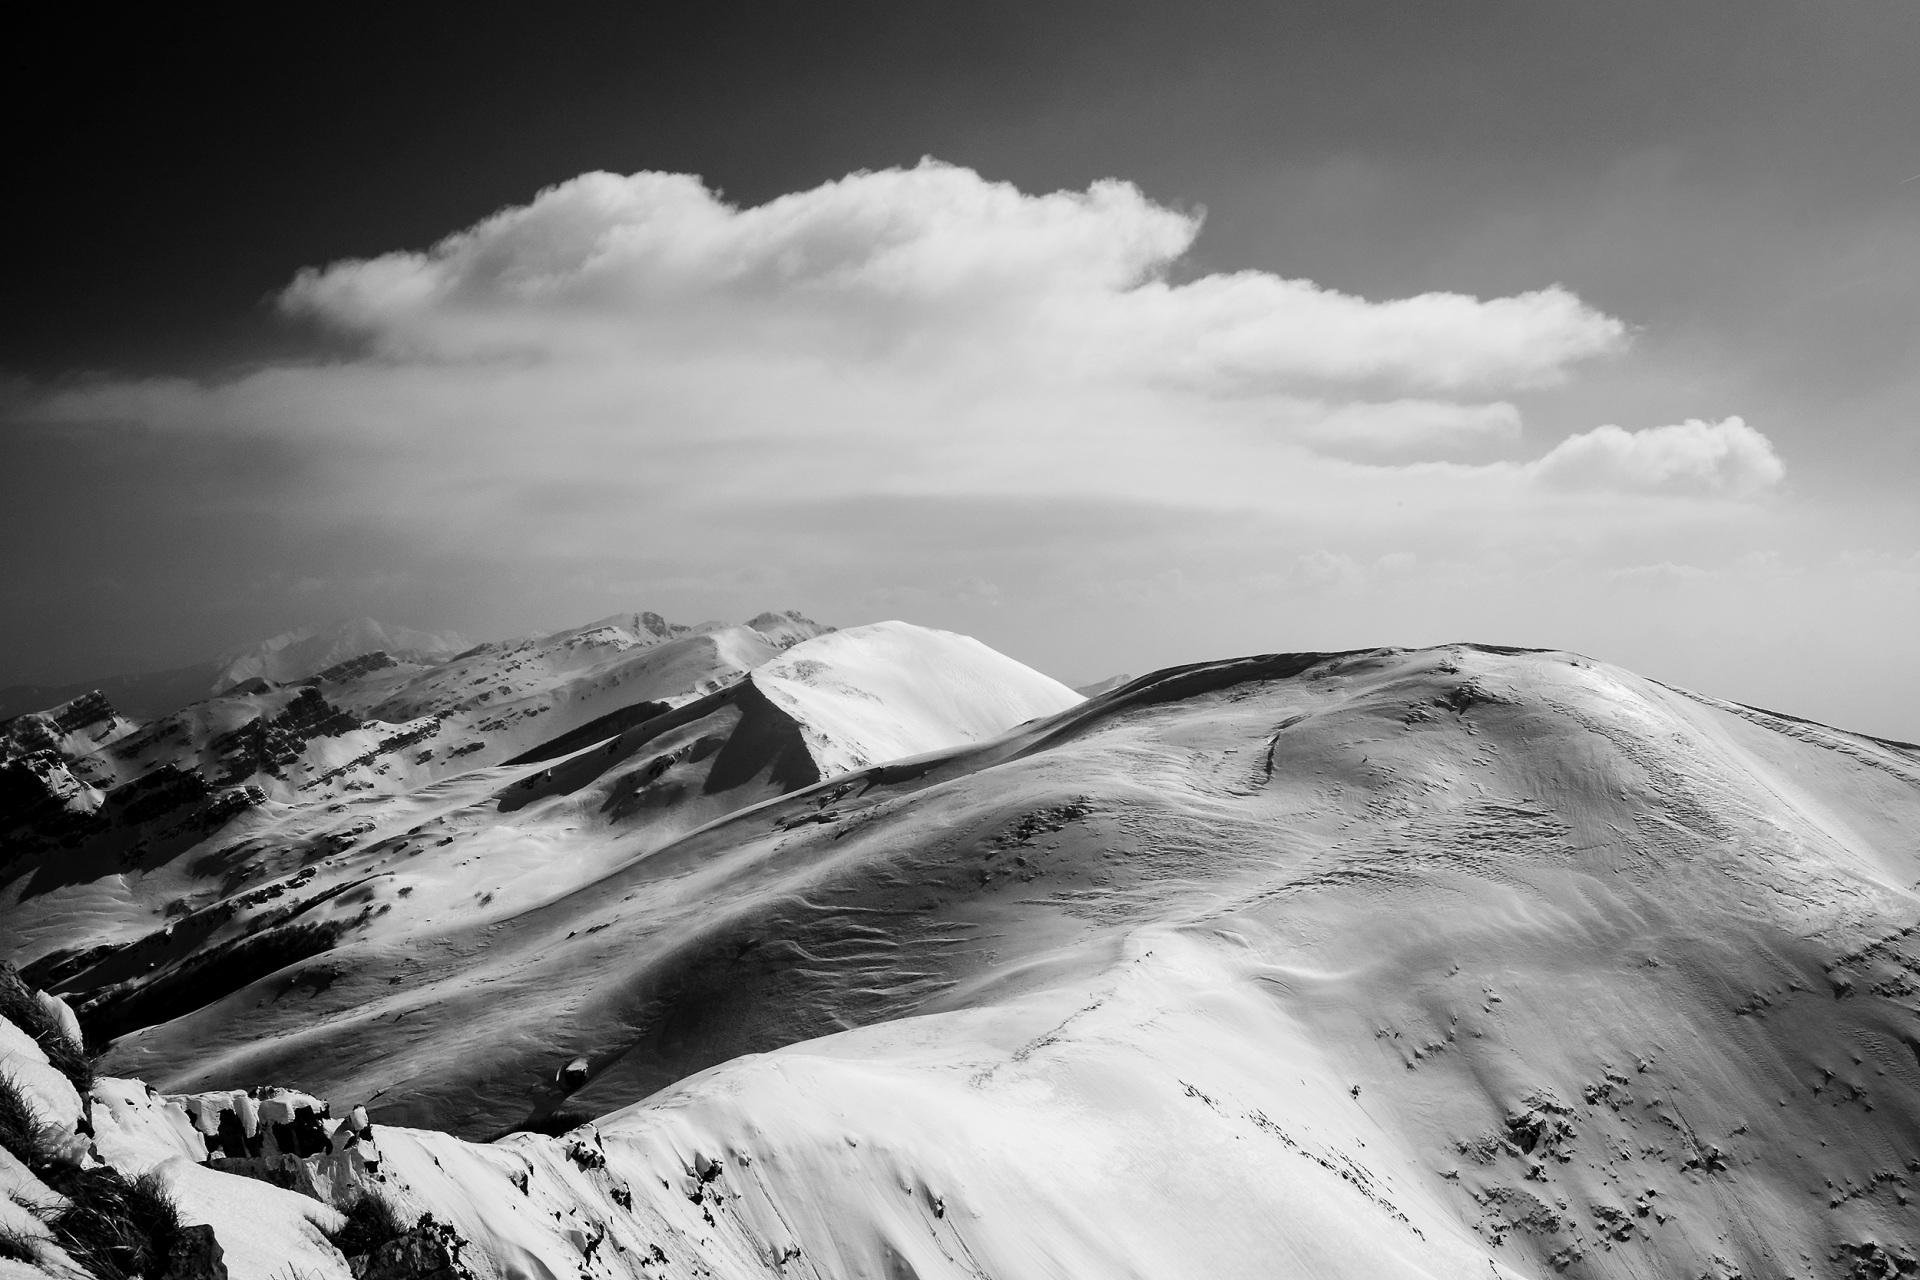 Monte Aquila - Appennino Parmense - Italy